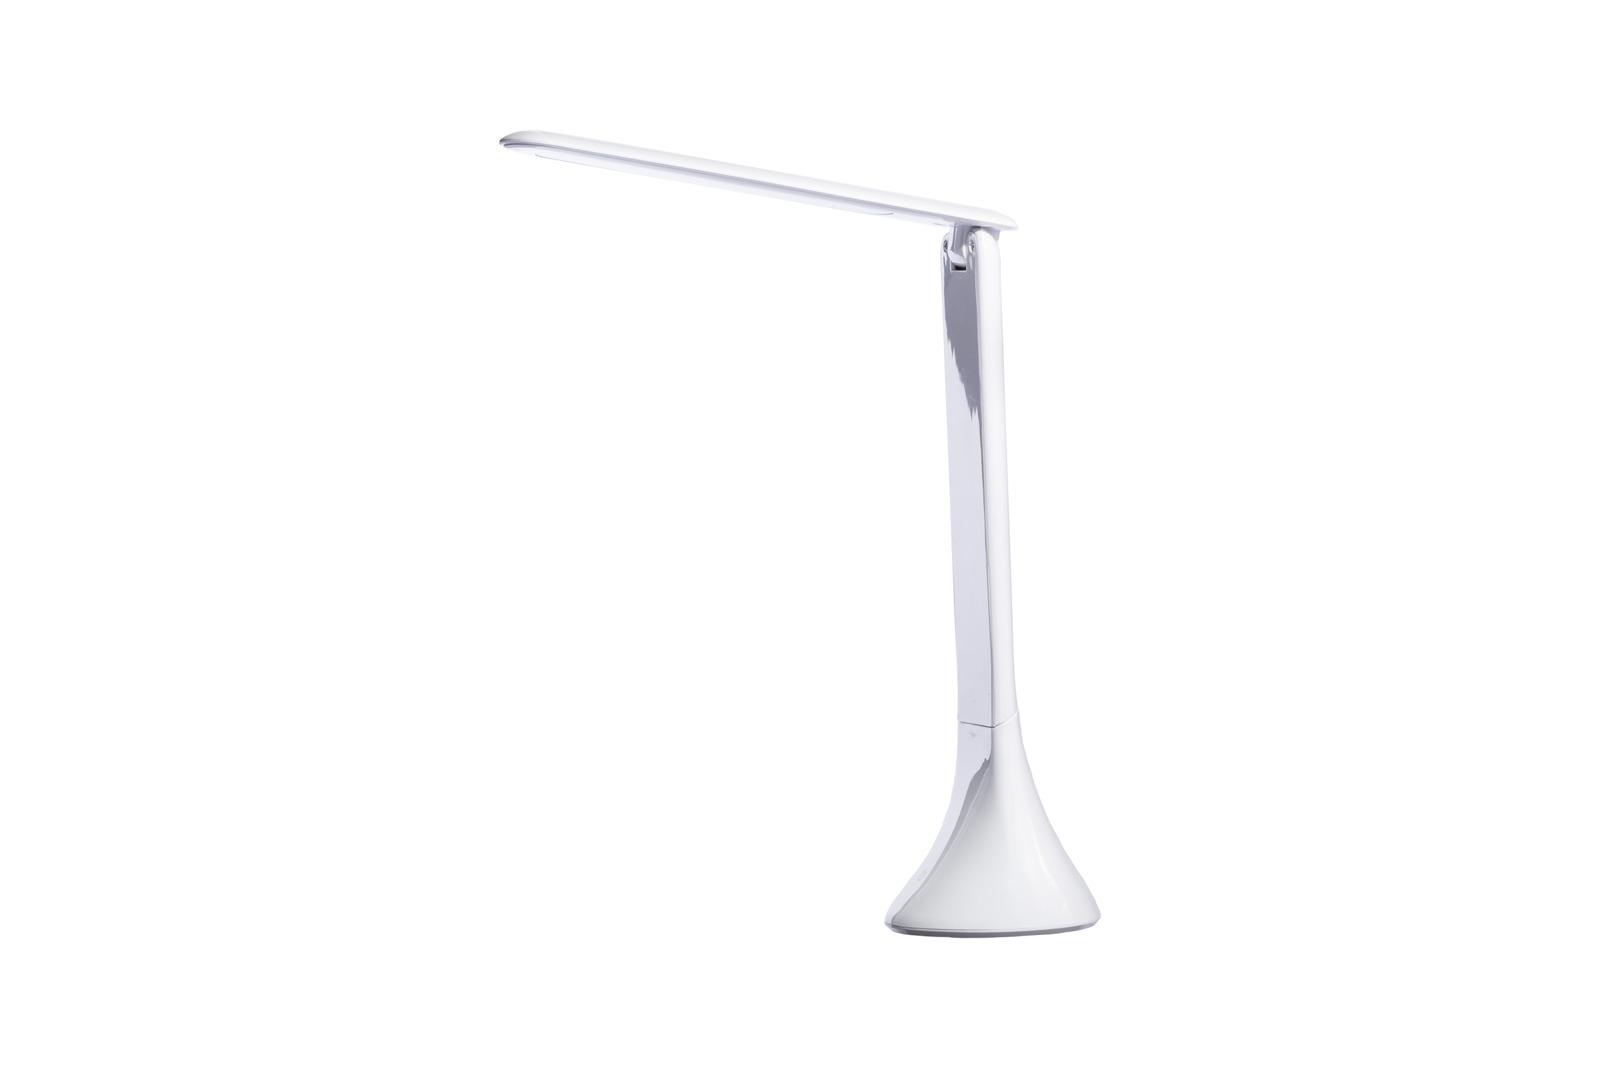 Foldable Touch Desk Lamp 18 LED